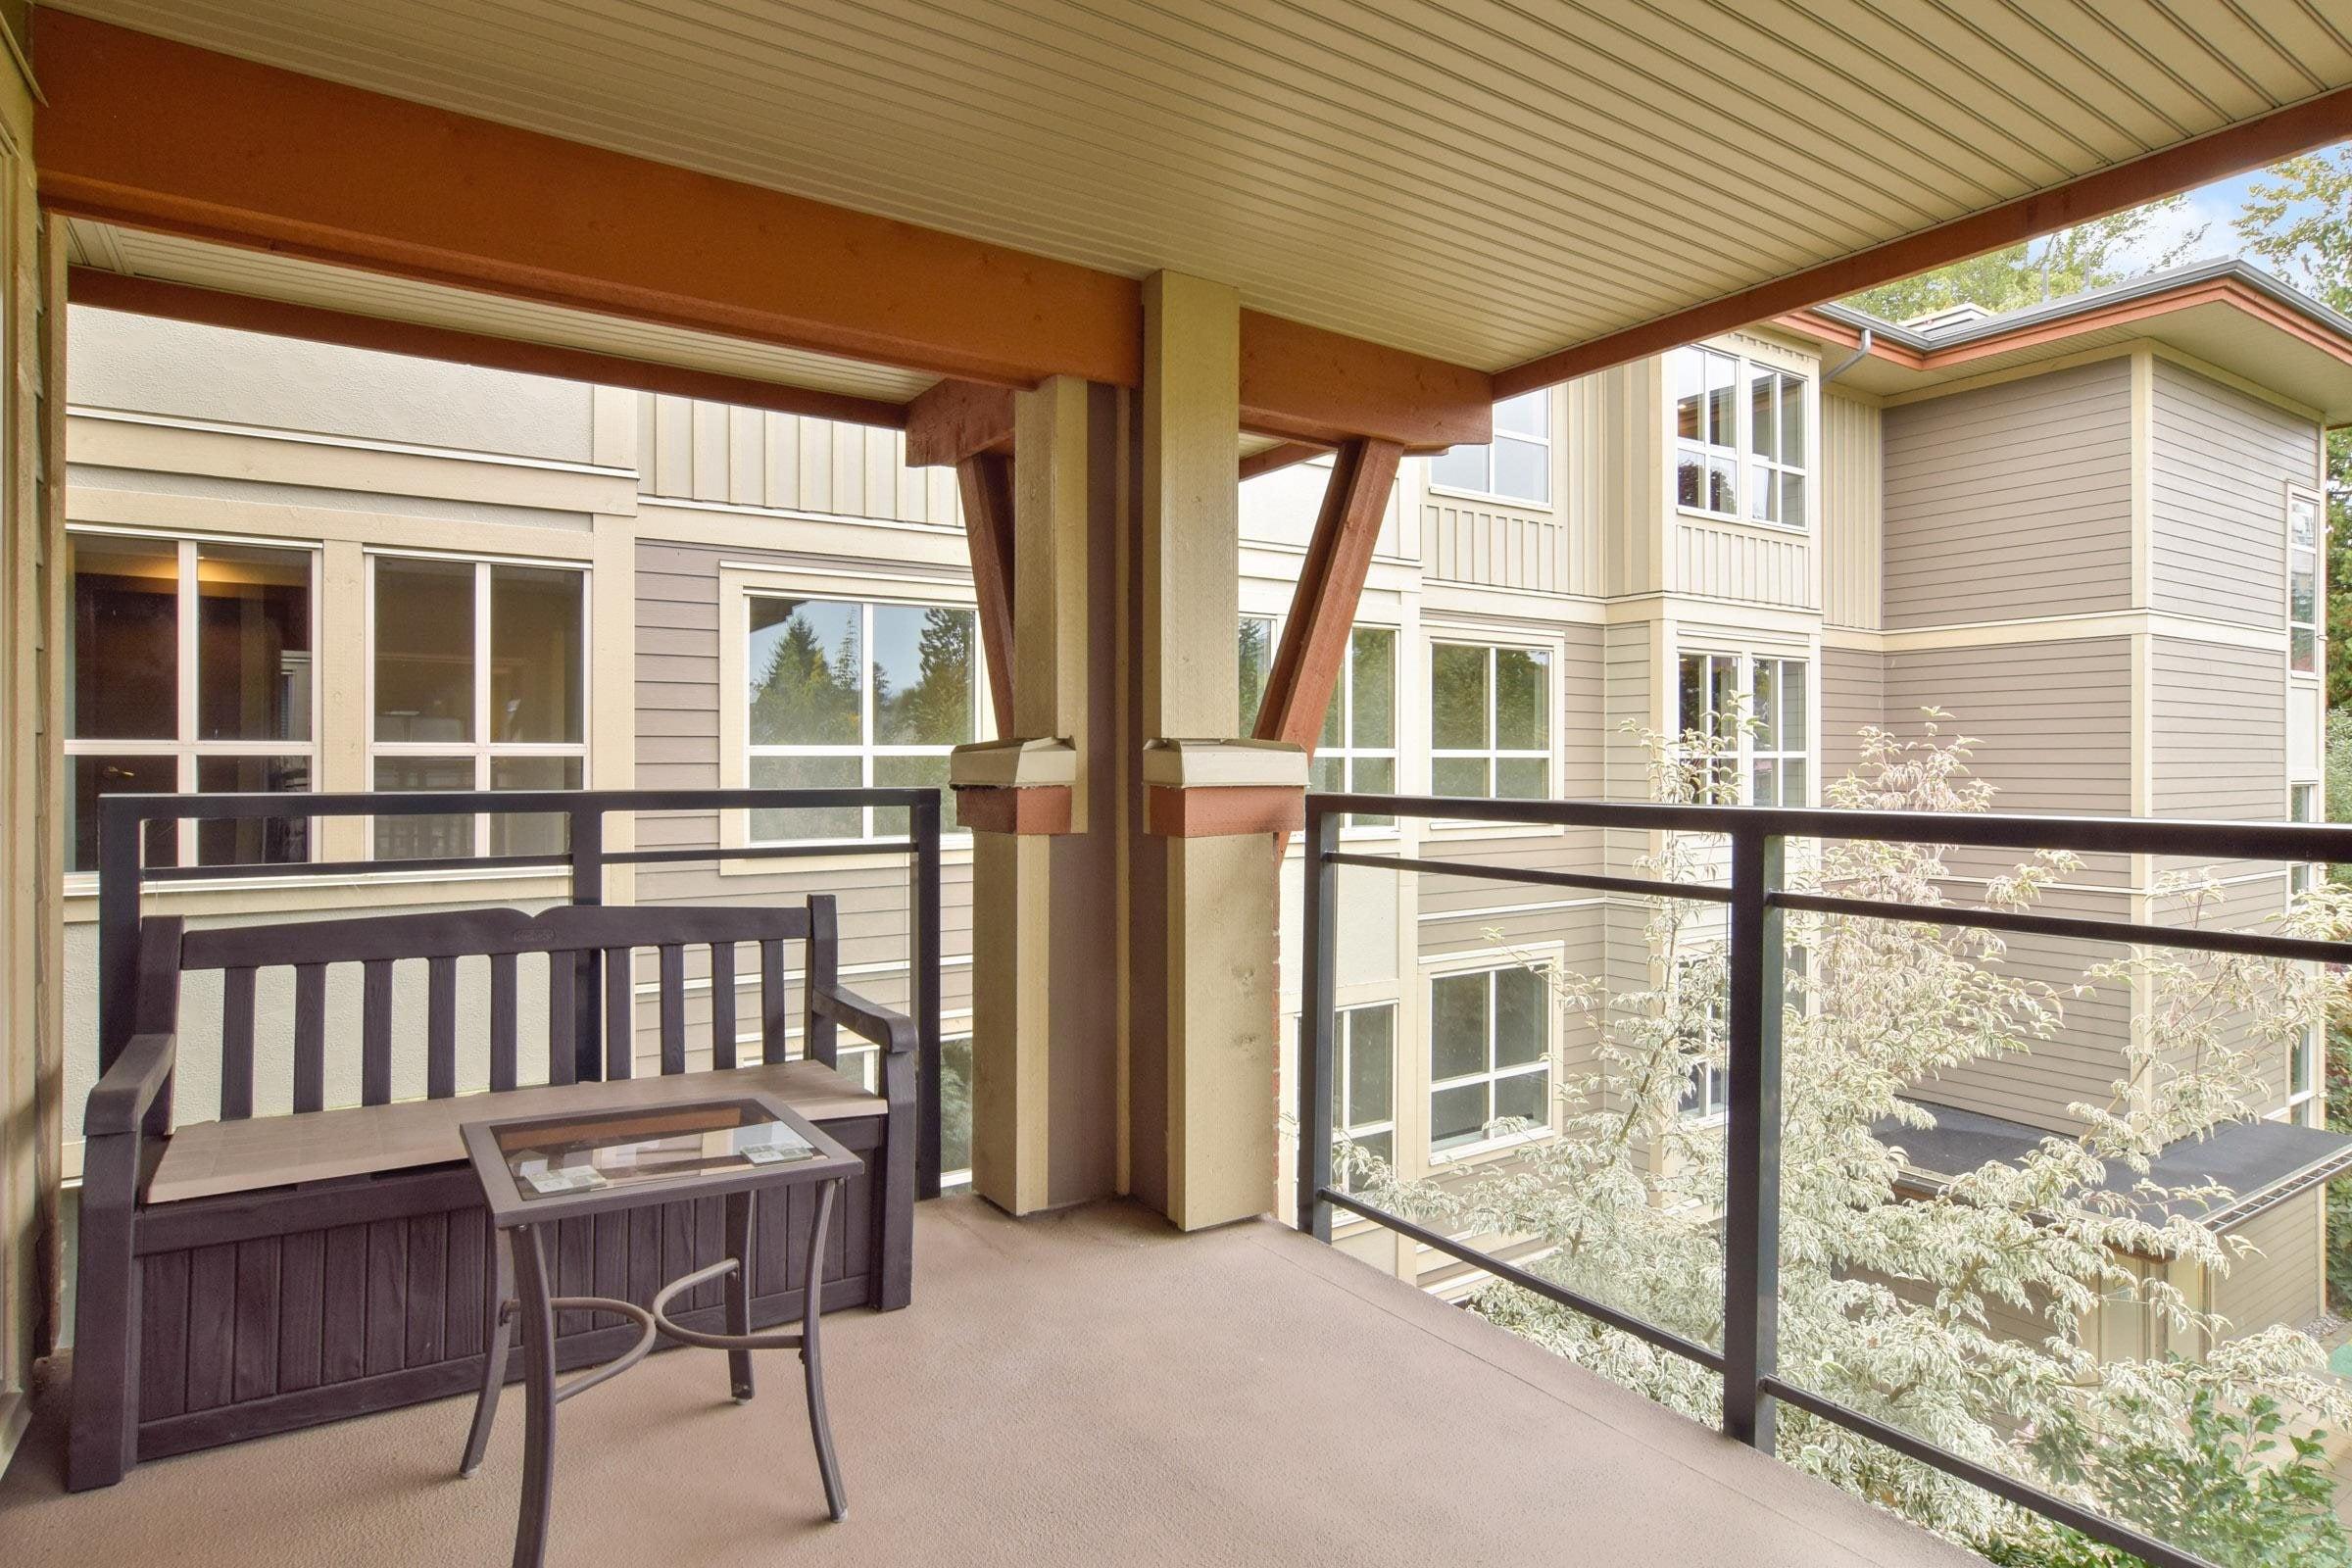 301 7131 STRIDE AVENUE - Edmonds BE Apartment/Condo for sale, 1 Bedroom (R2625669) - #17